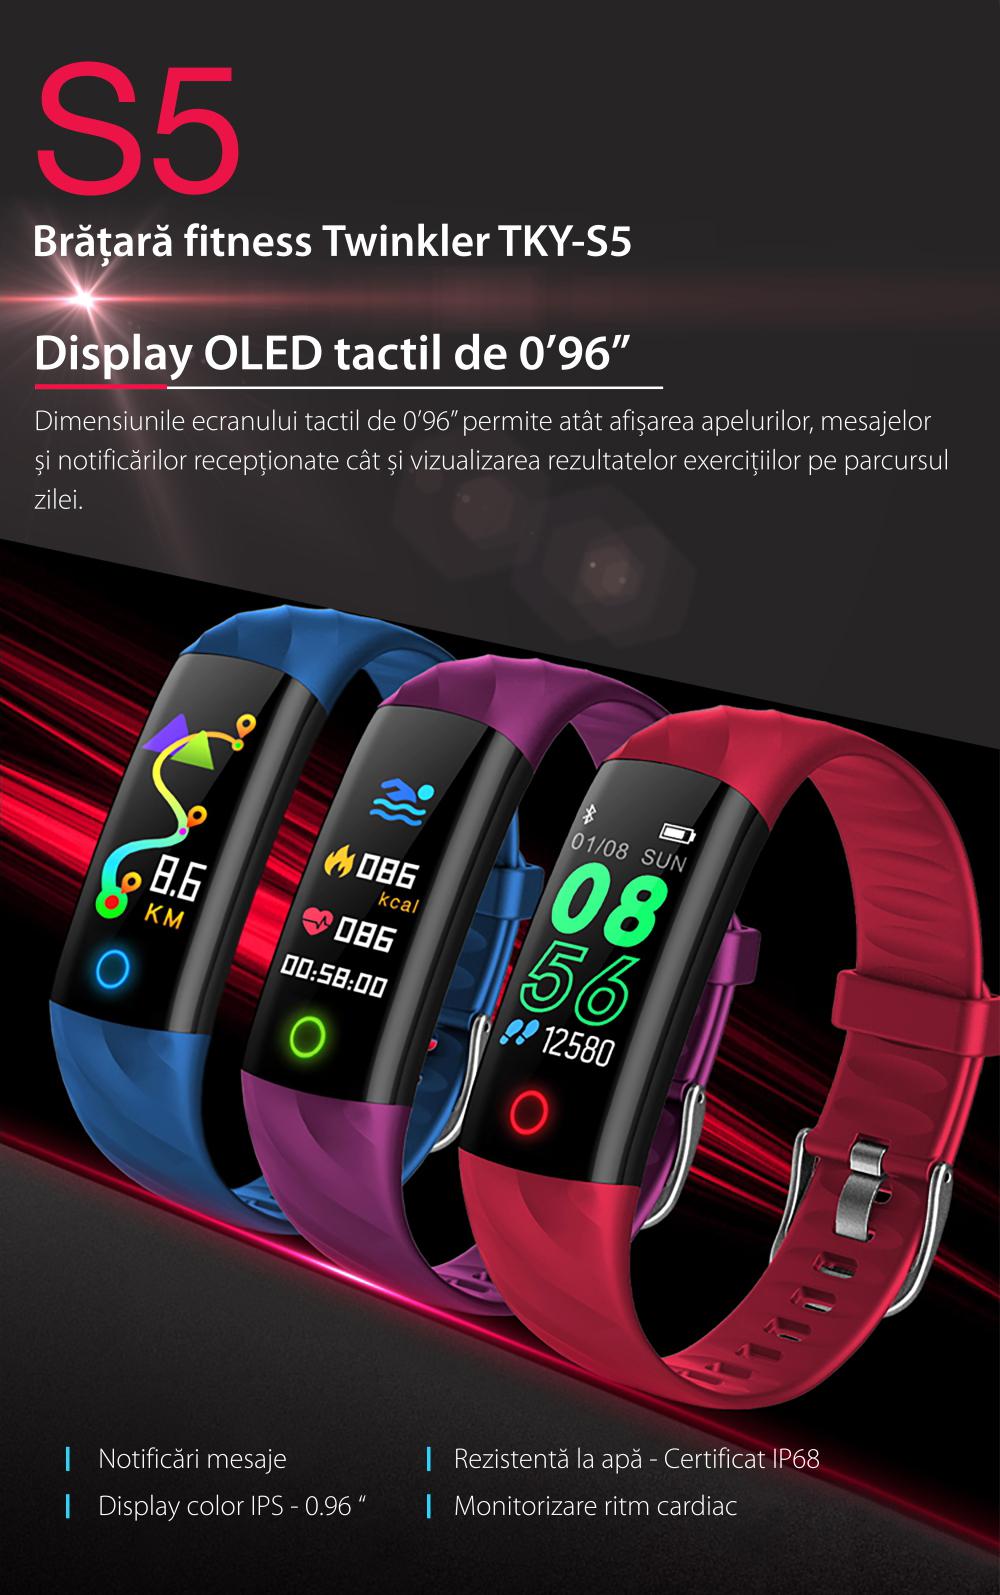 Bratara fitness inteligenta TKY-S5 cu functie de monitorizare ritm cardiac, Tensiune arteriala, Monitorizare somn, Pedometru, Notificari, Iluminare LED, Rosie